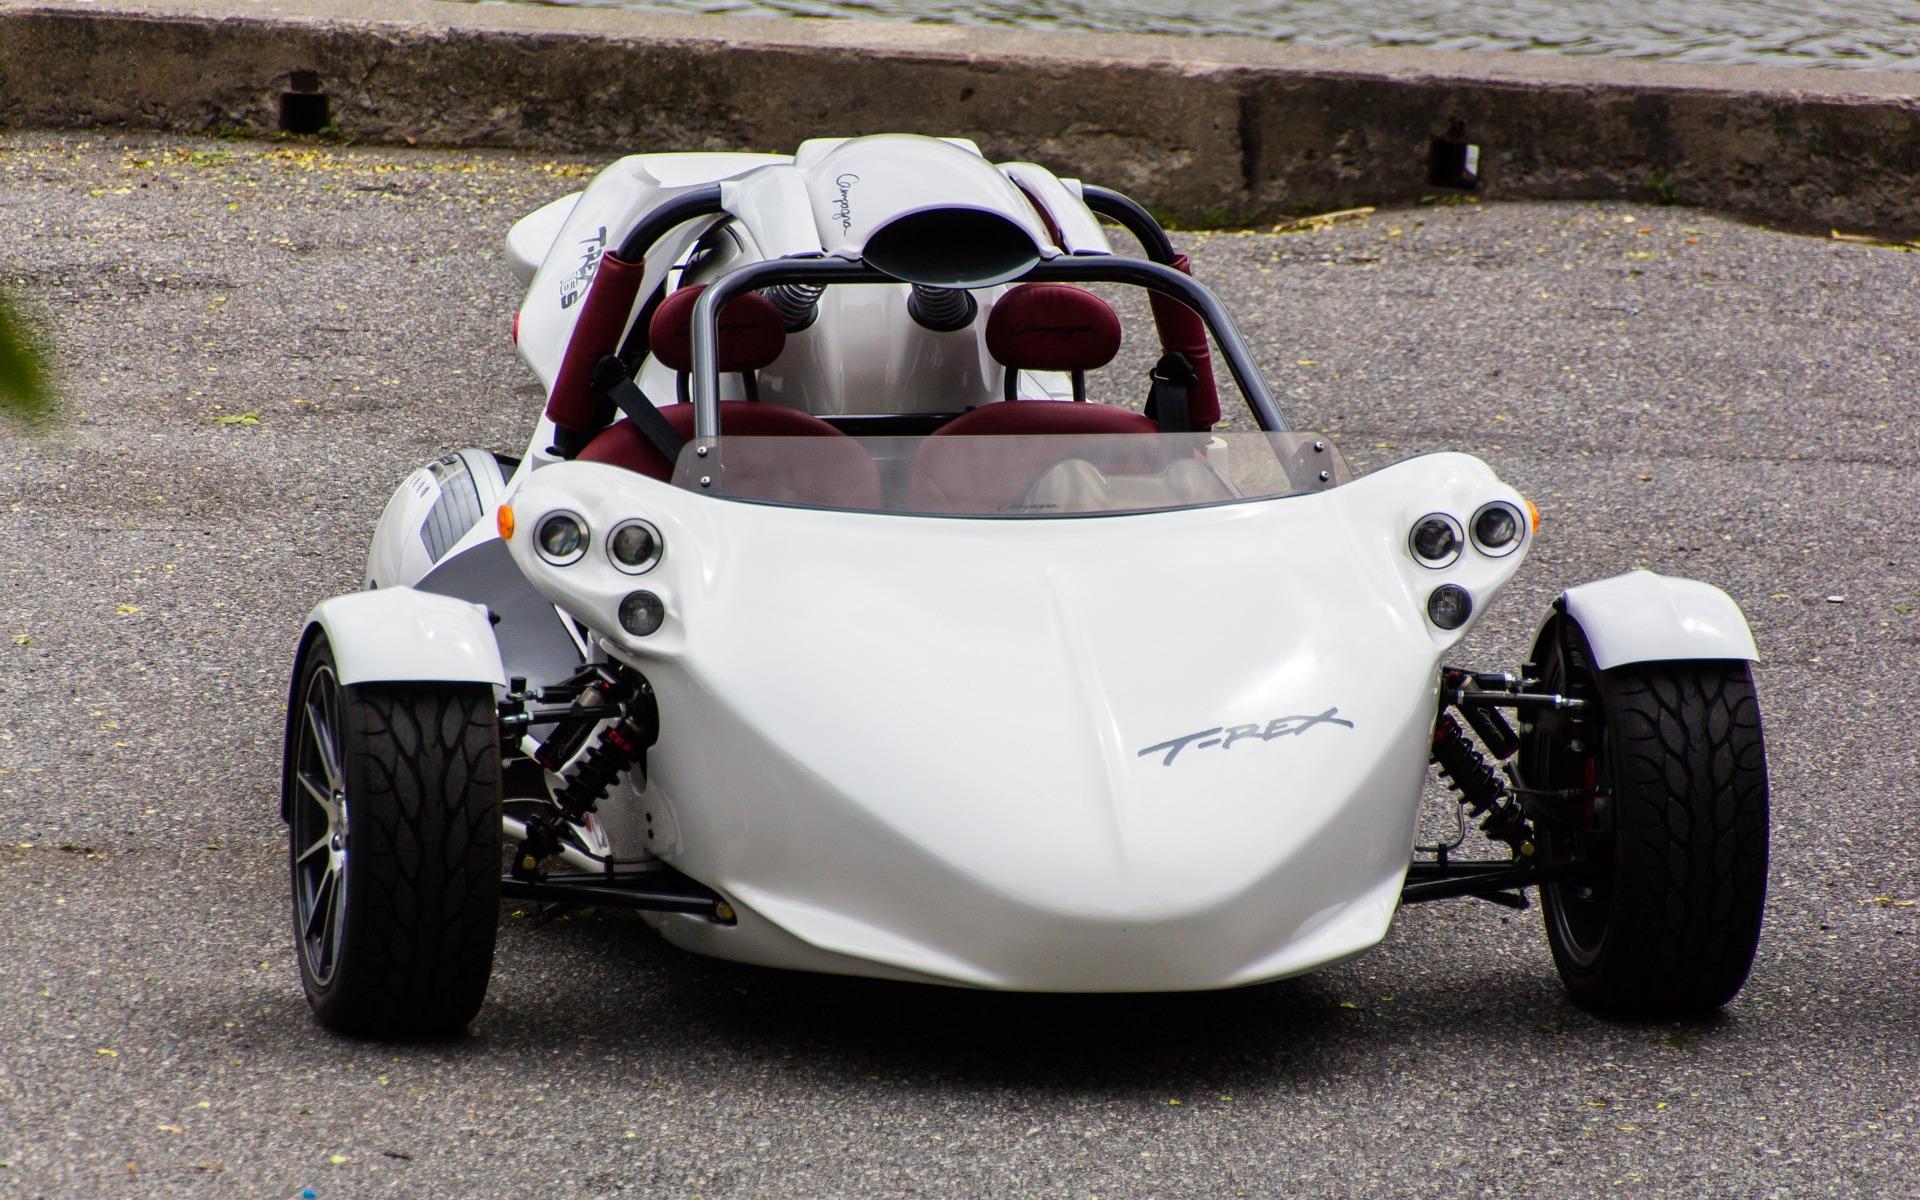 T Rex Car Price >> 2016 Campagna Motors T Rex 16s Photos 1 7 The Car Guide